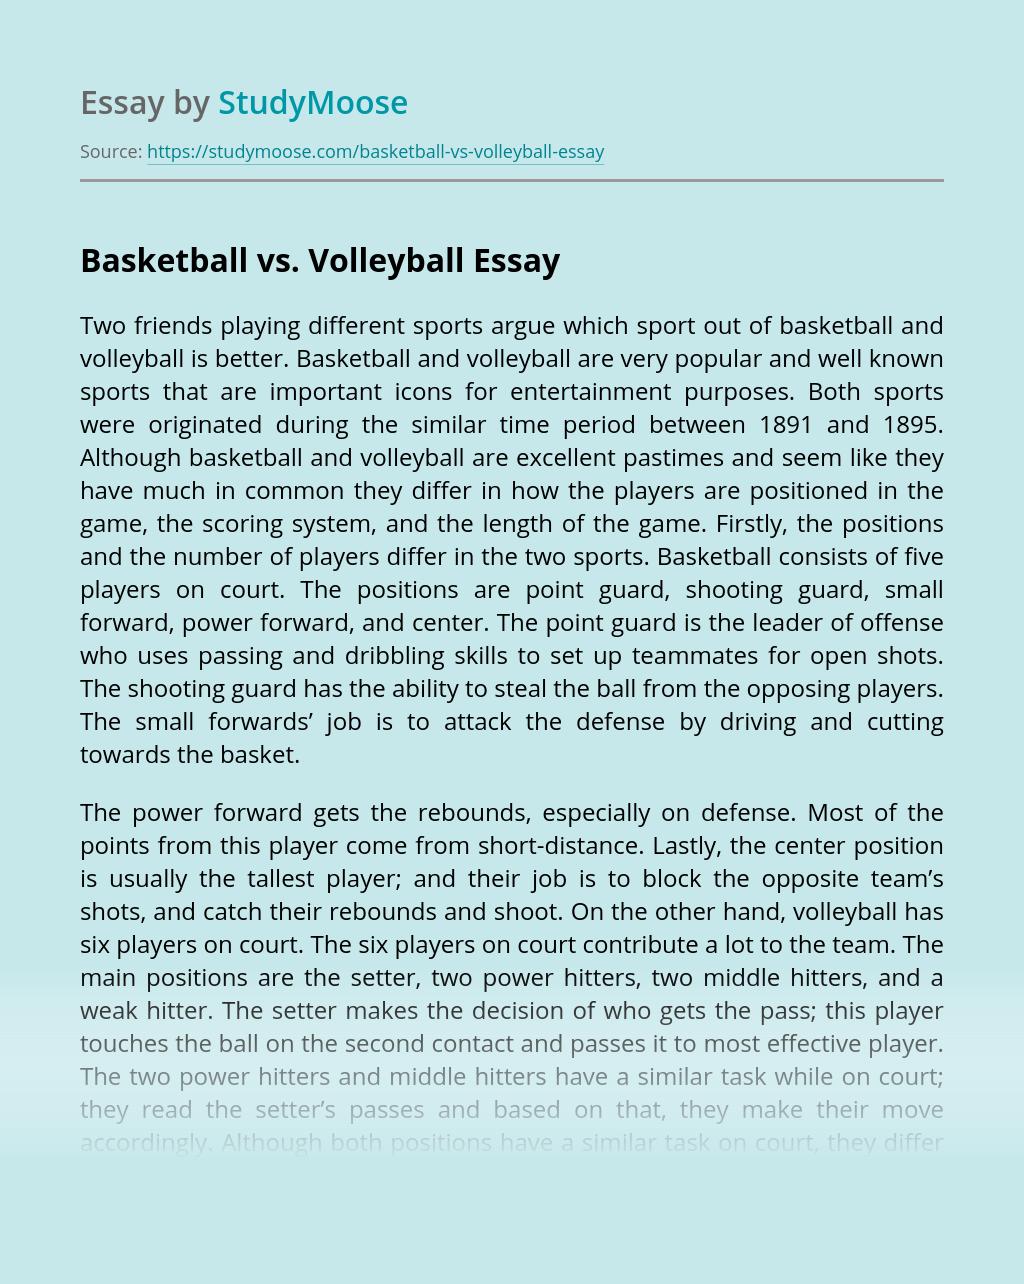 Basketball vs. Volleyball